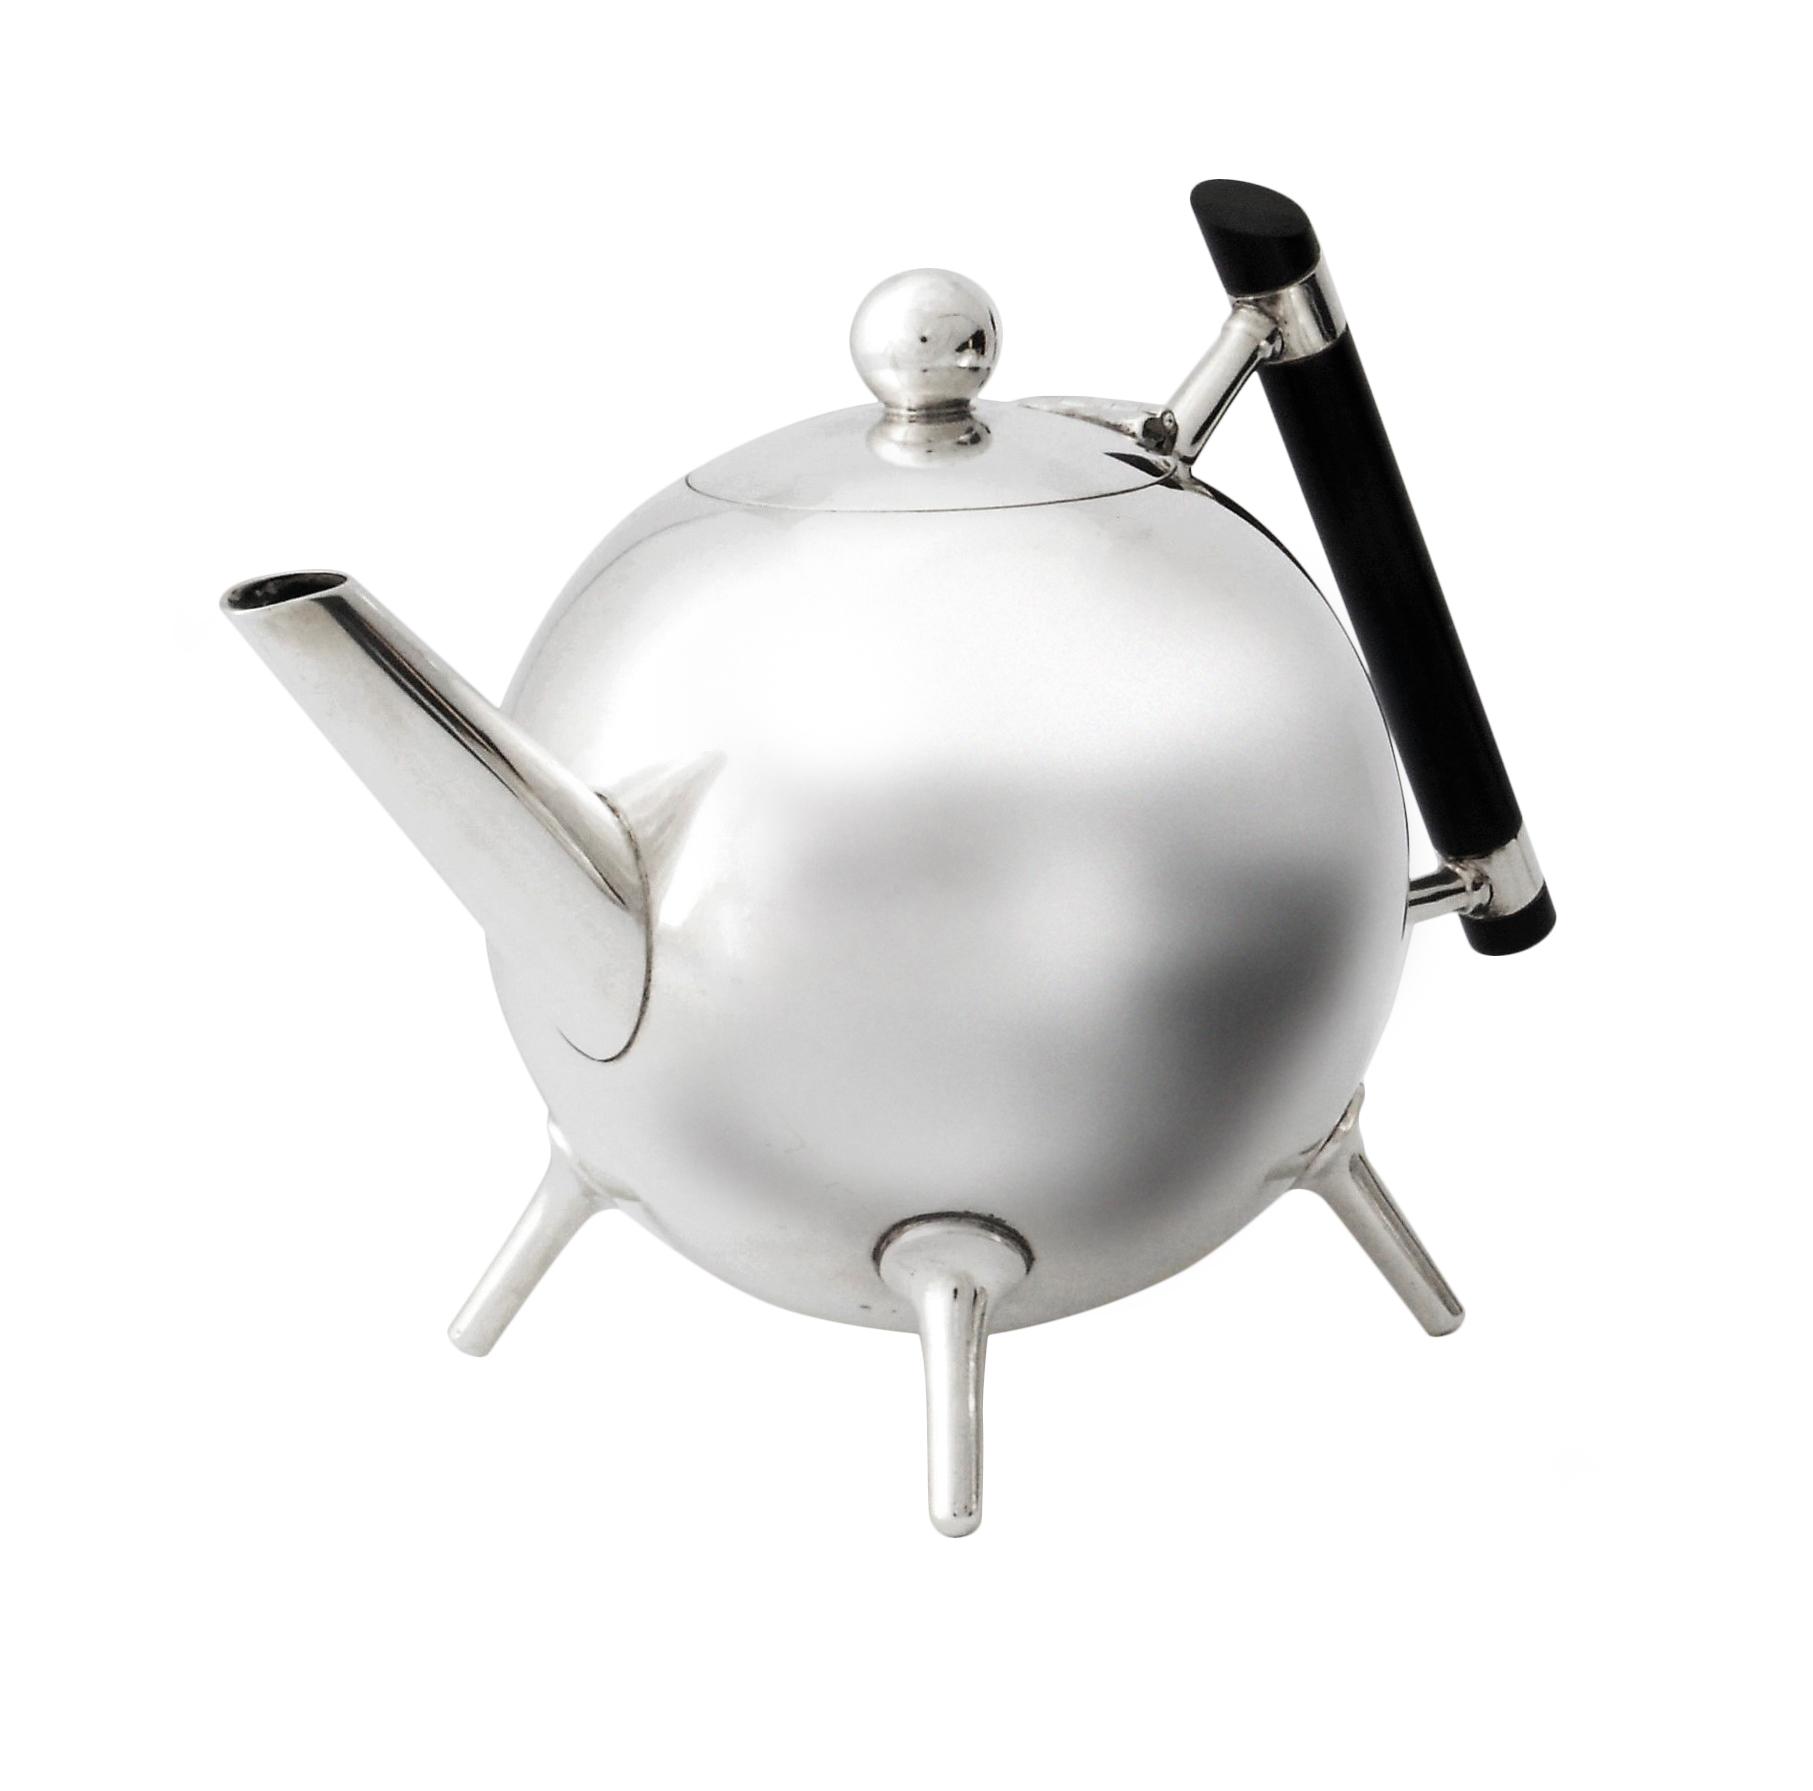 Christopher dresser silver